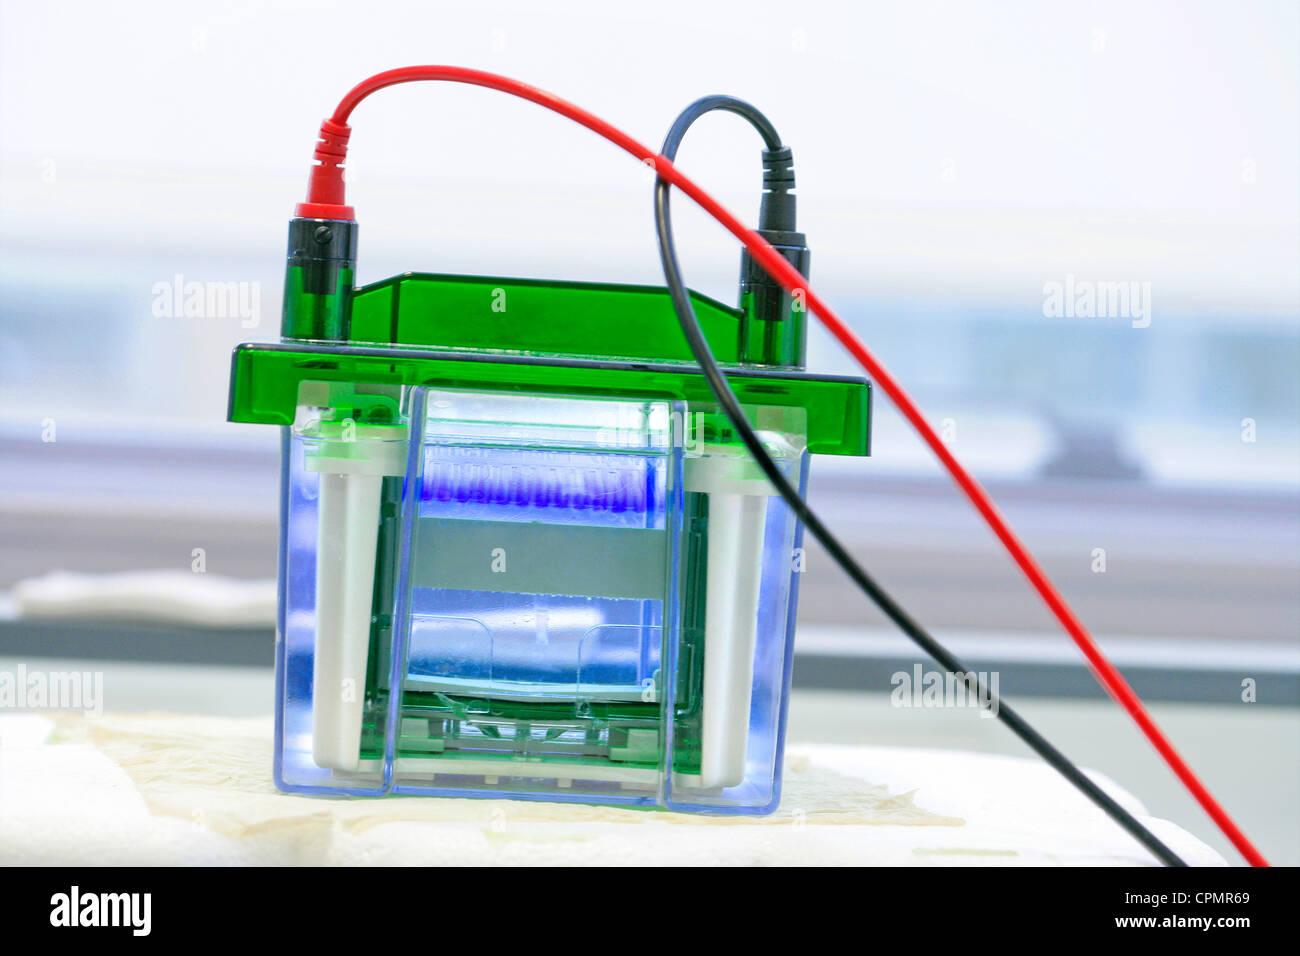 ELECTROPHORESIS - Stock Image